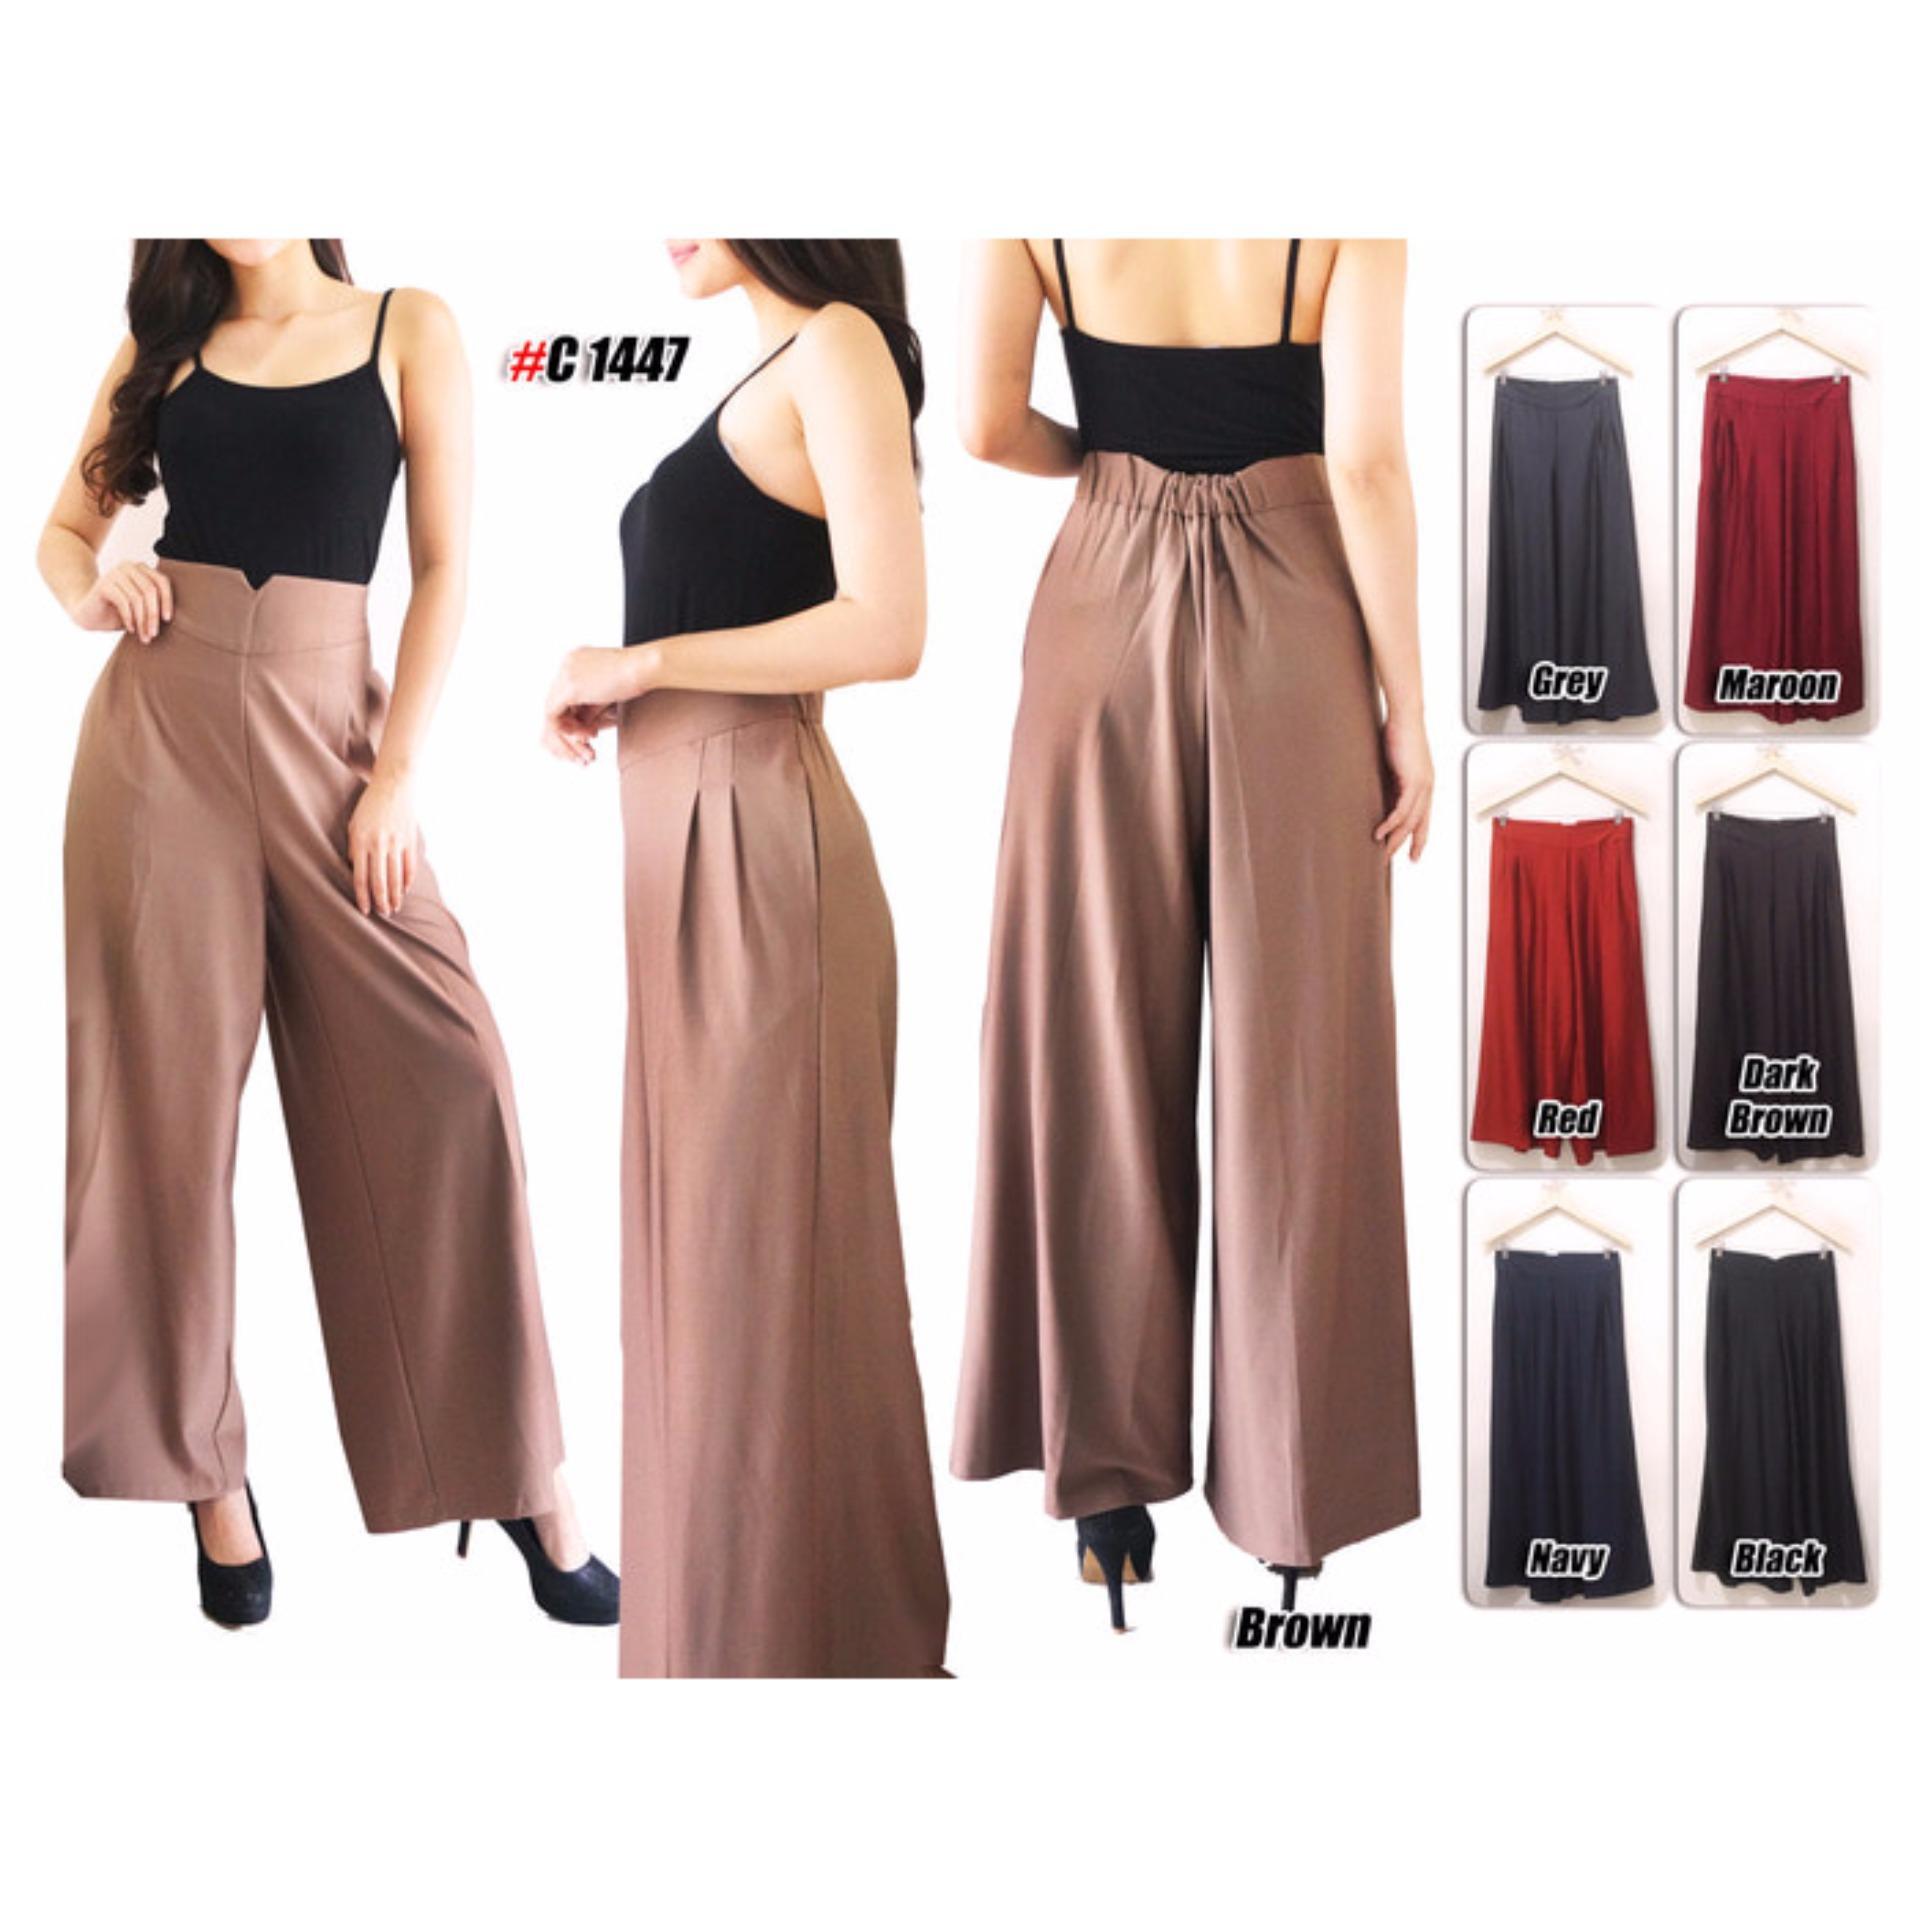 Review Celana Kulot Posey Celana Panjang Long Pants Celana Wanita